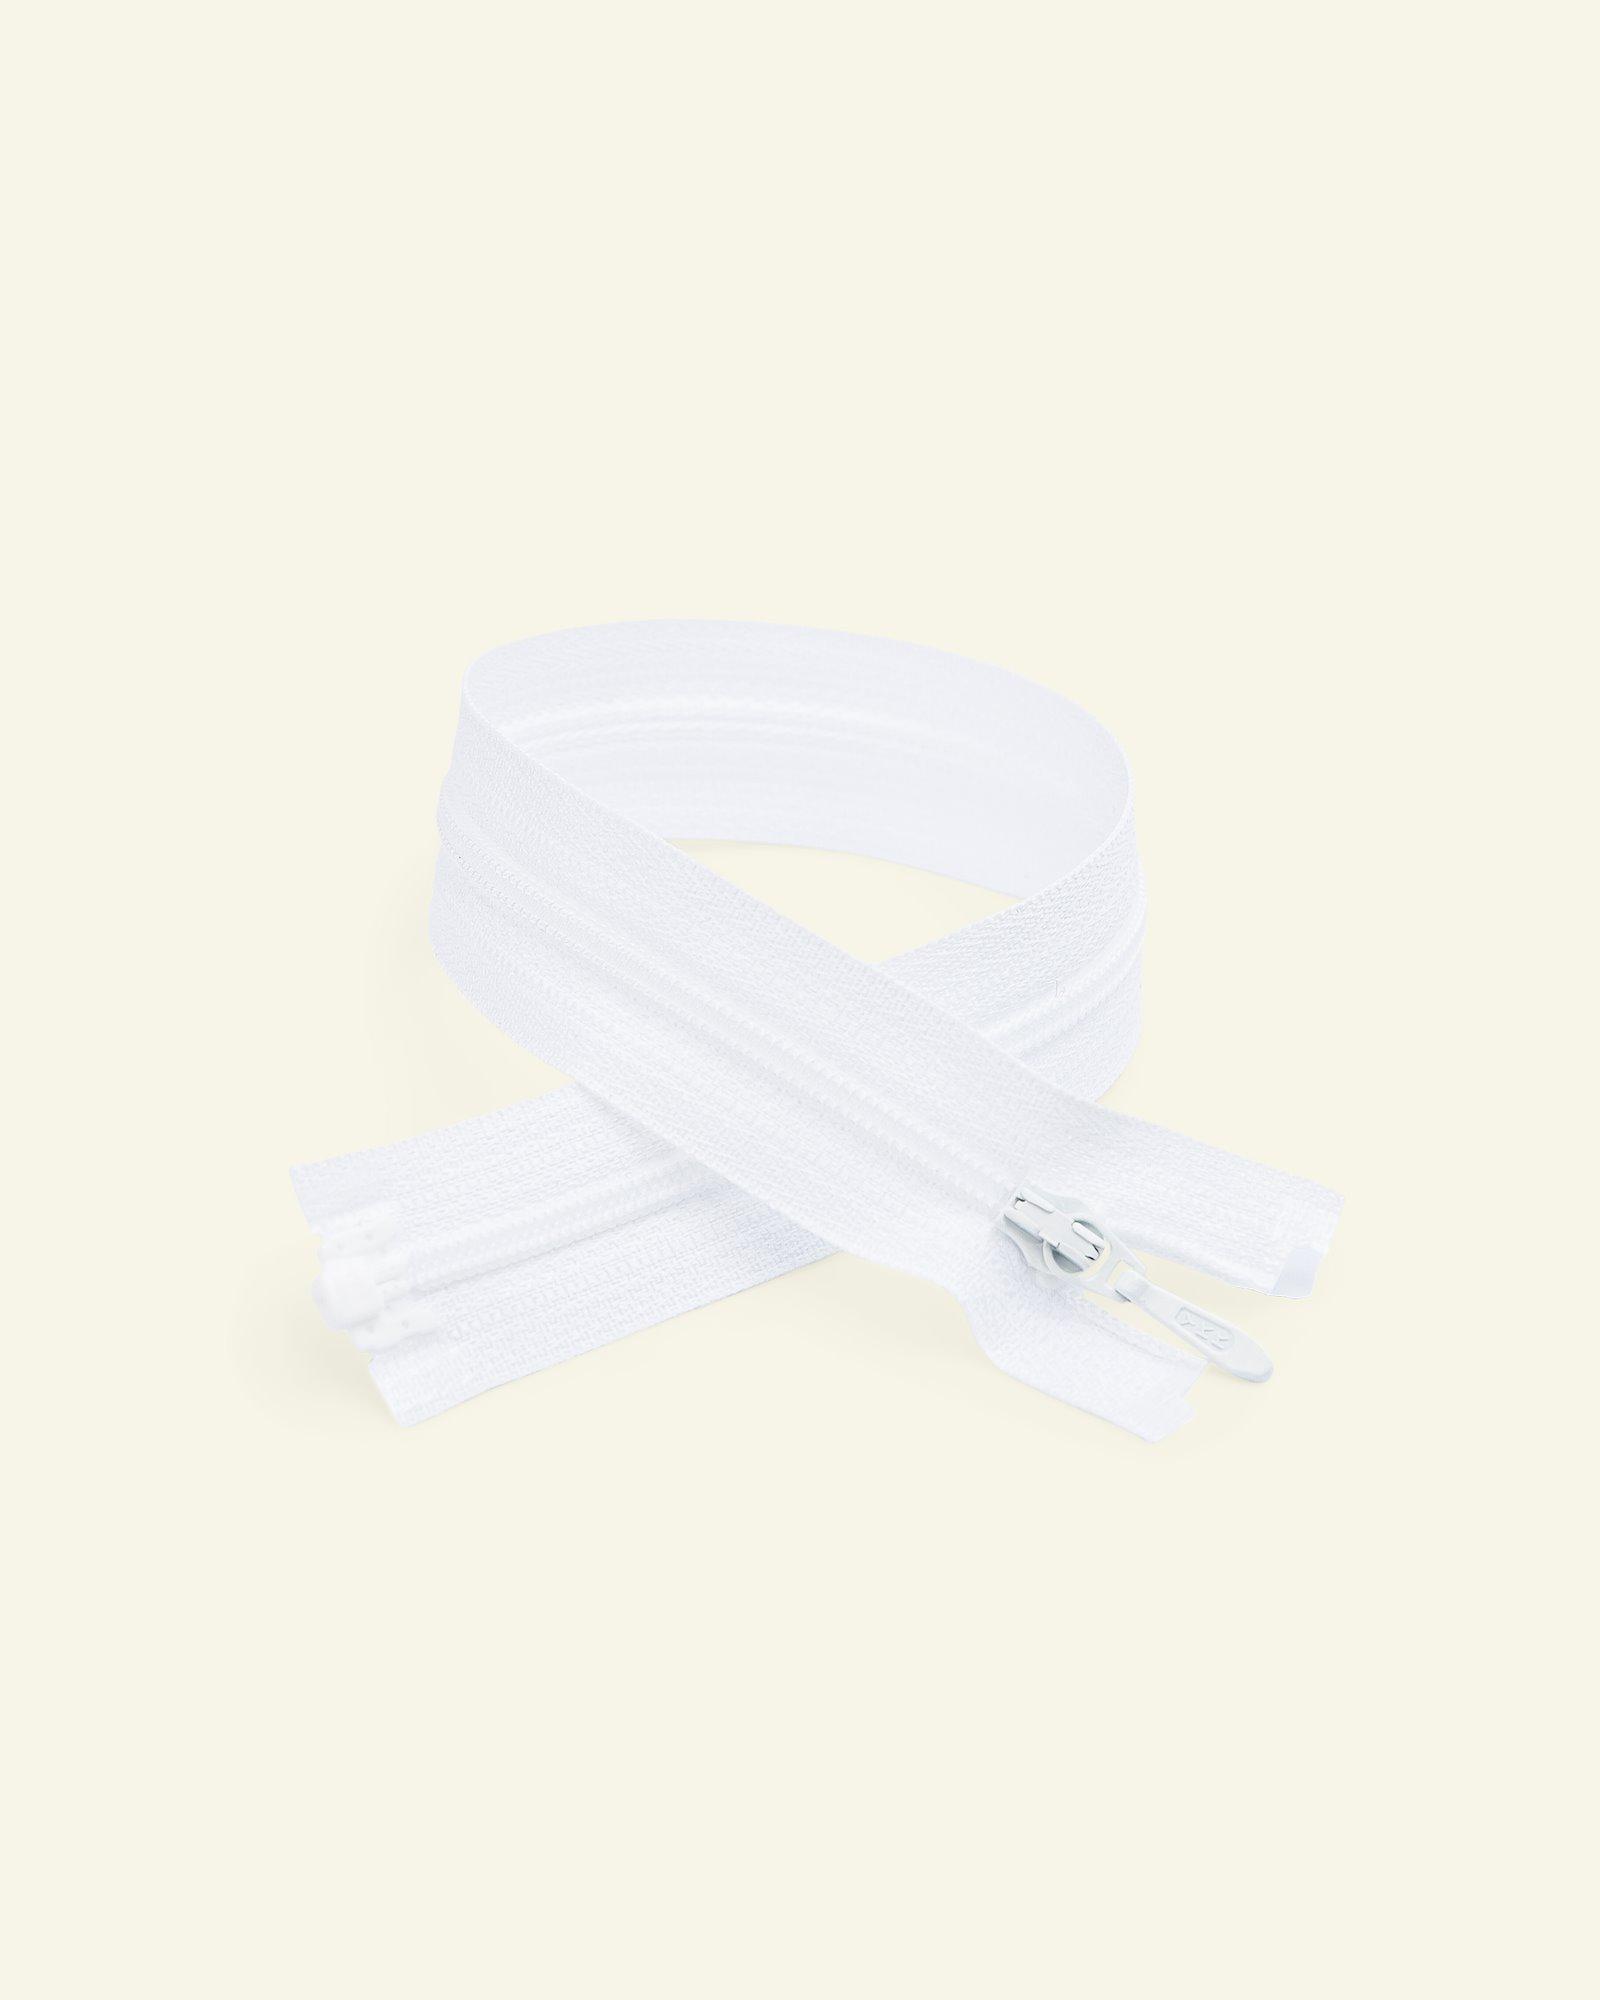 YKK zip 4mm coil open end white